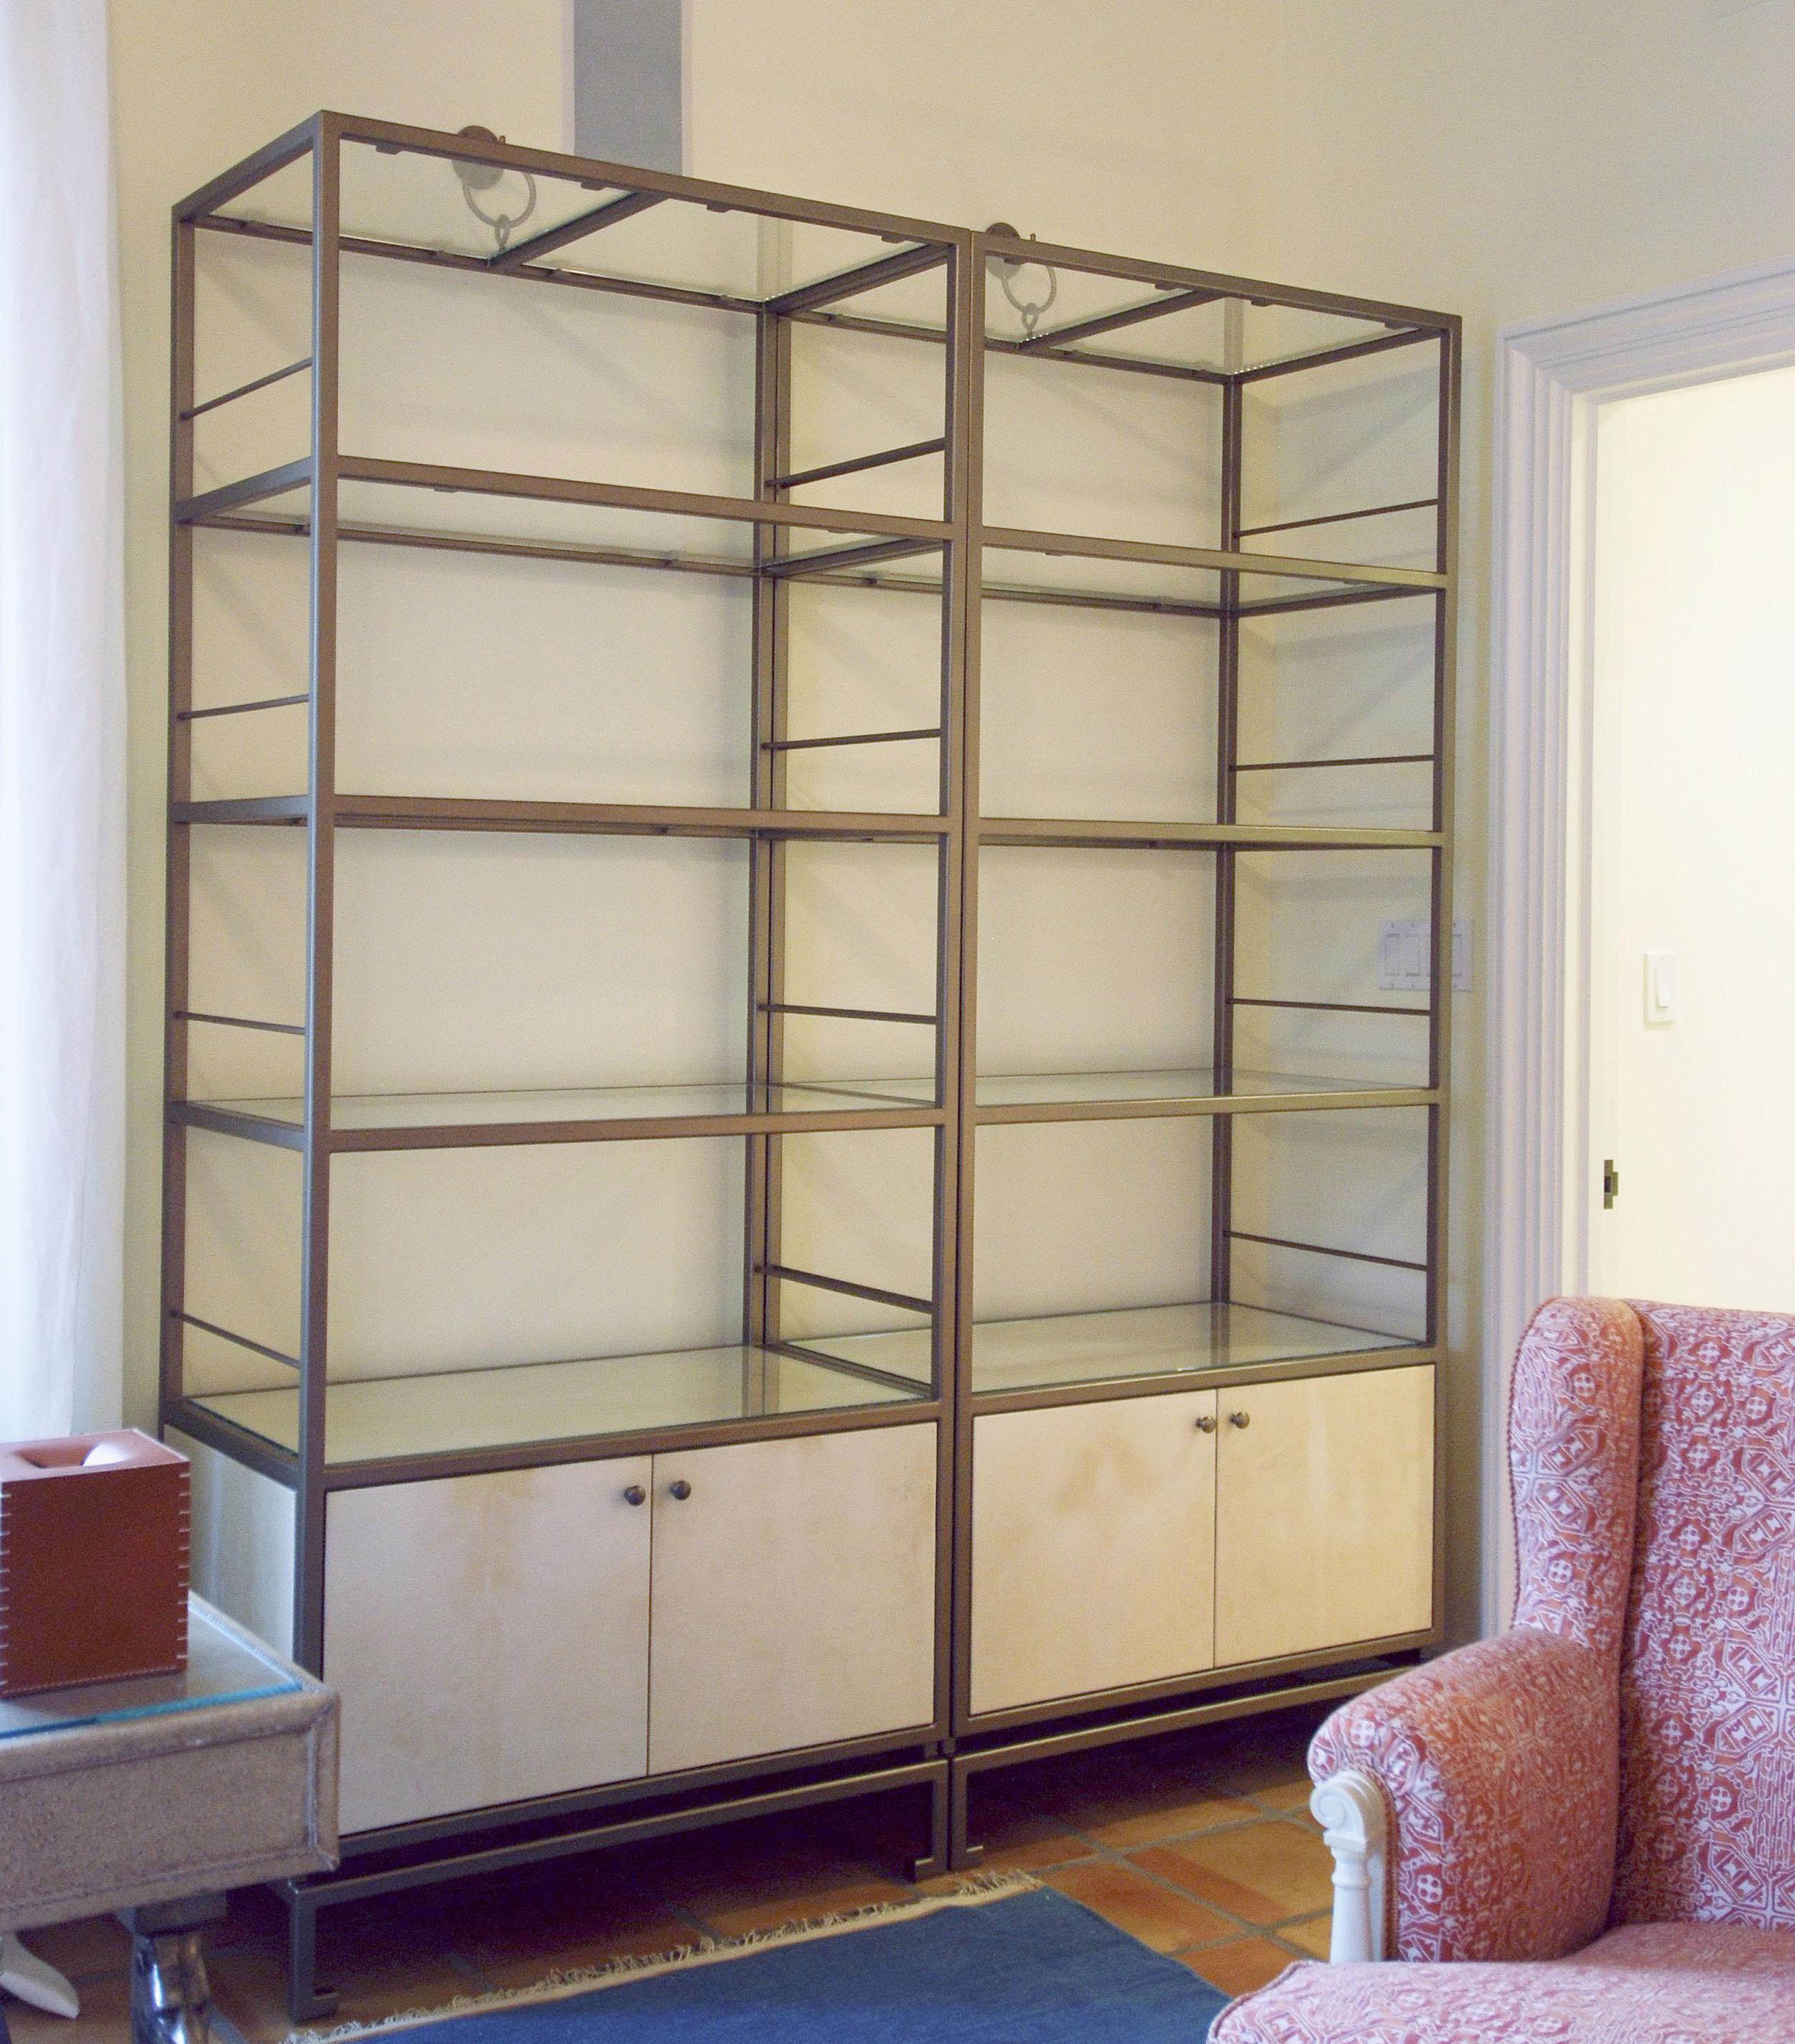 602 Frt. View Cabinet.jpg